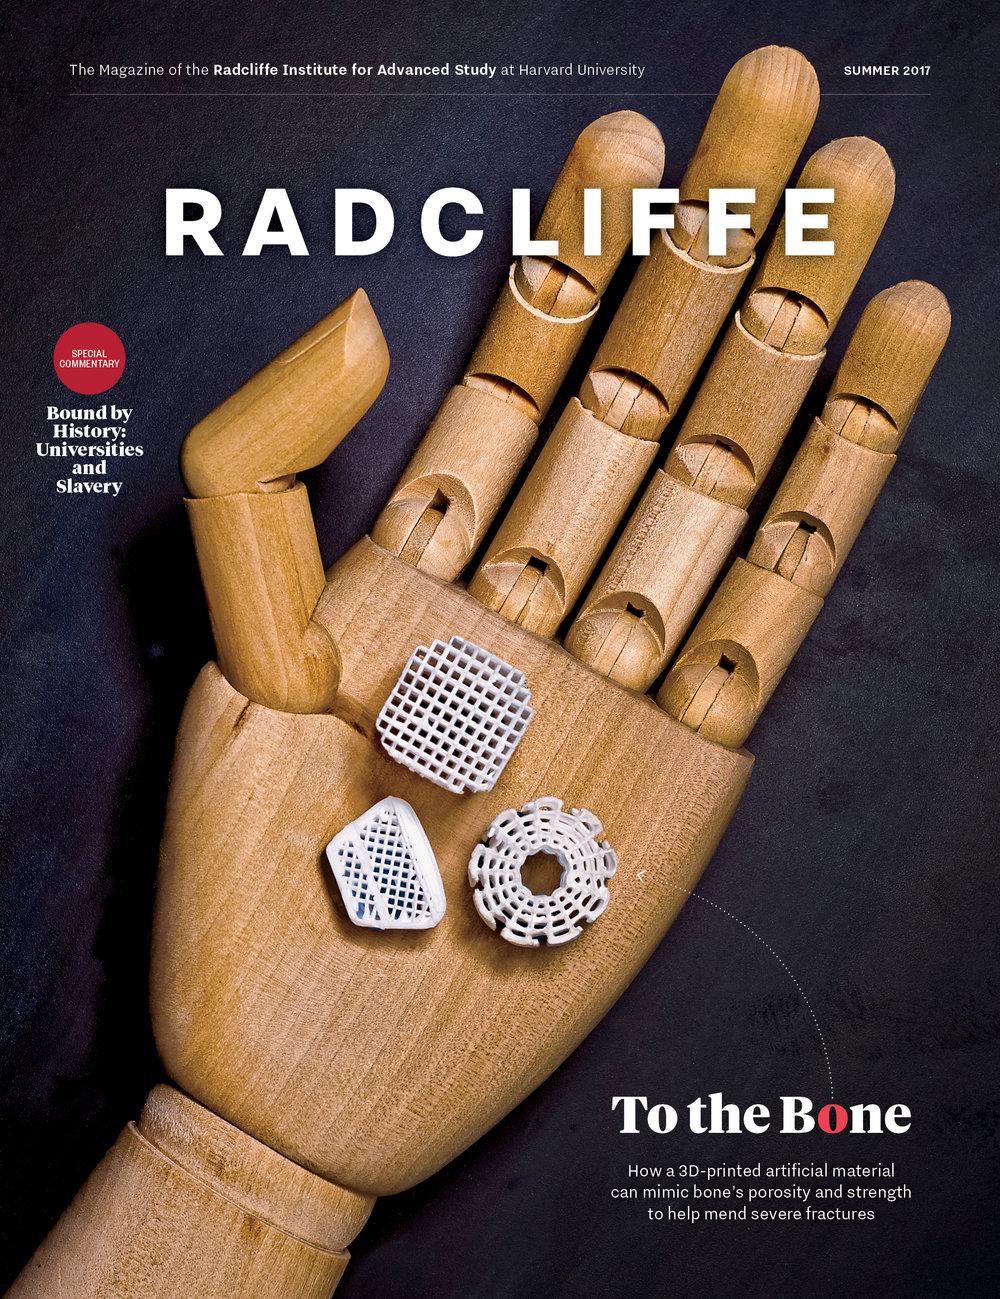 RAD06-FOB-Cover-FINAL3.jpg